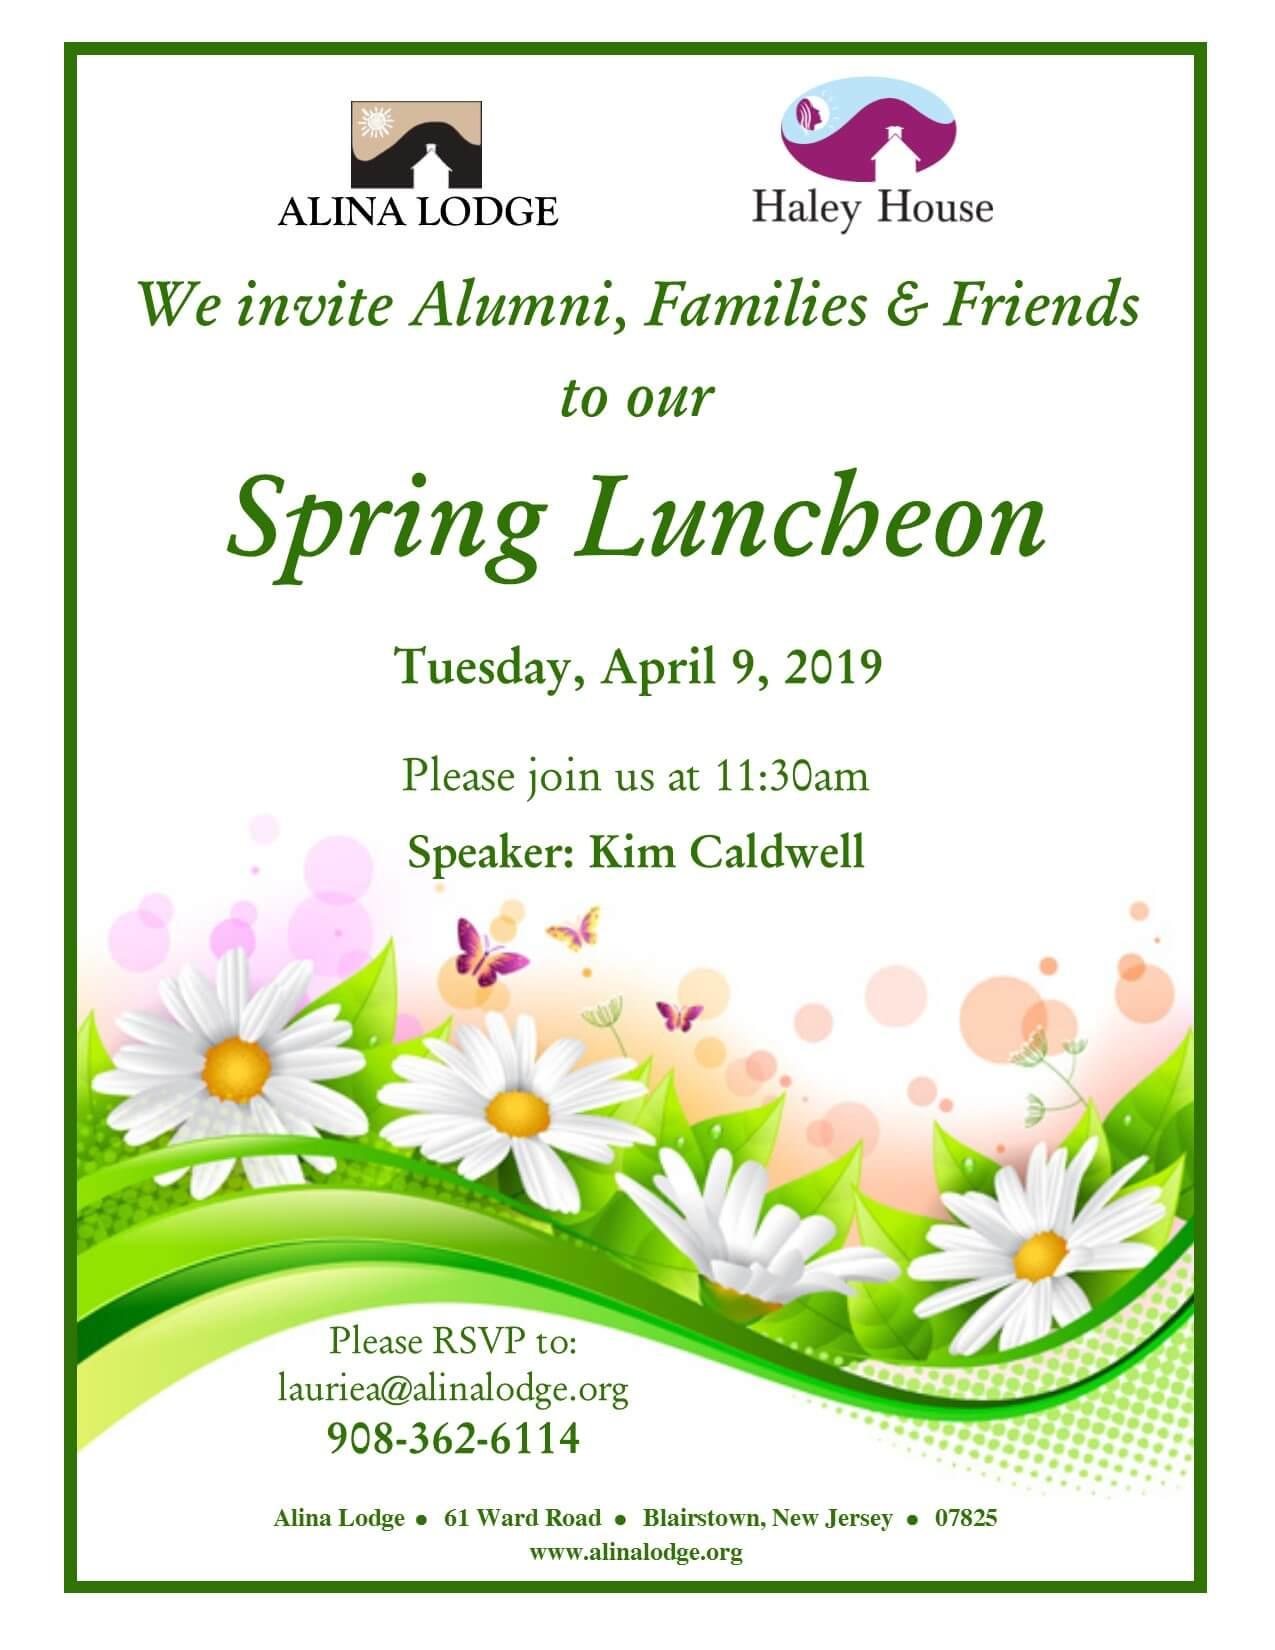 Spring Luncheon at Alina Lodge